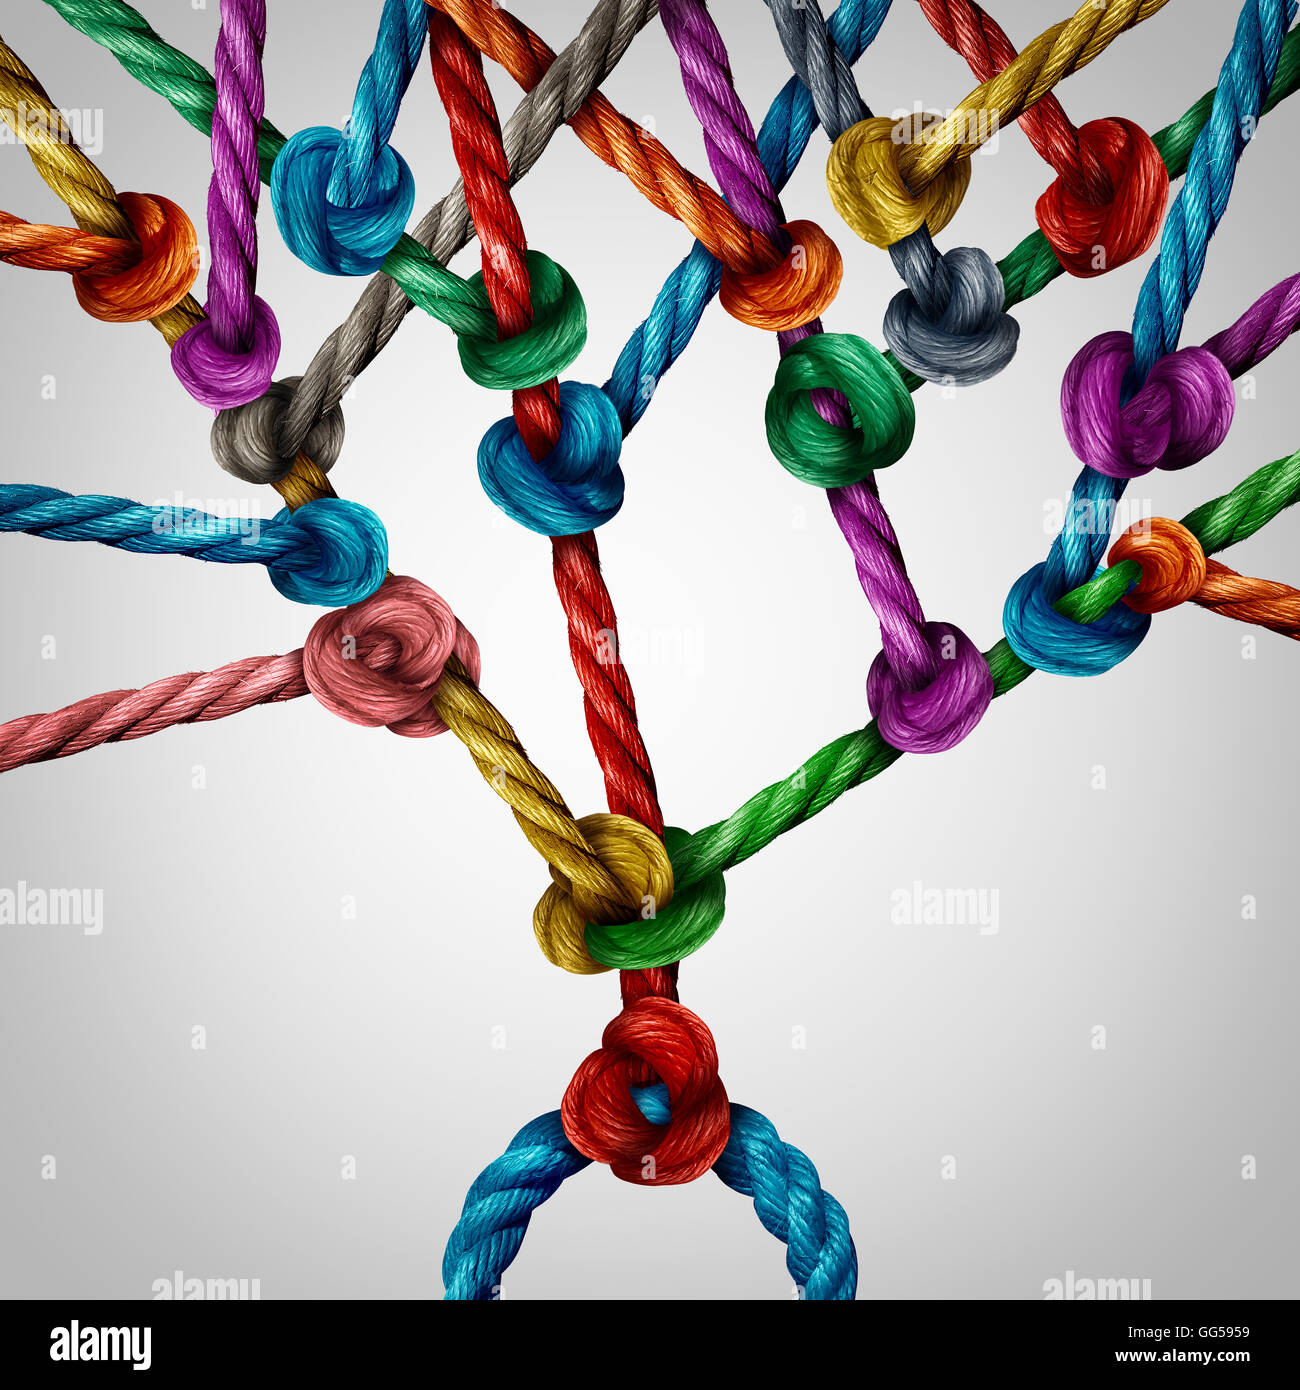 Árbol de red conexión conectados como un grupo de cuerdas atadas juntas como un crecimiento estructura Imagen De Stock